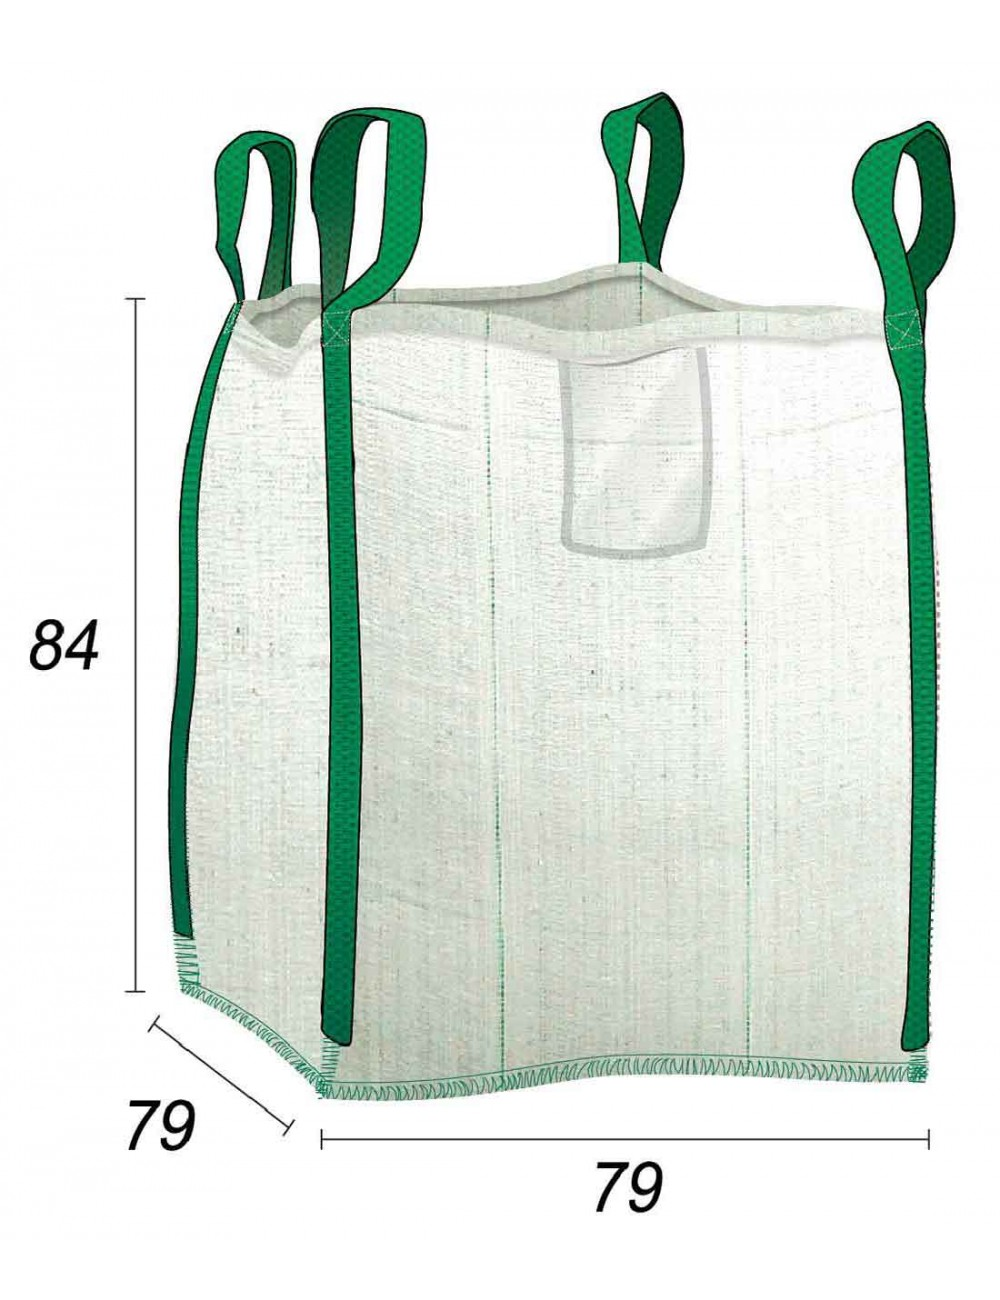 Sacchetti per rifiuti verdi 450L Individui ideali - 75X75X80